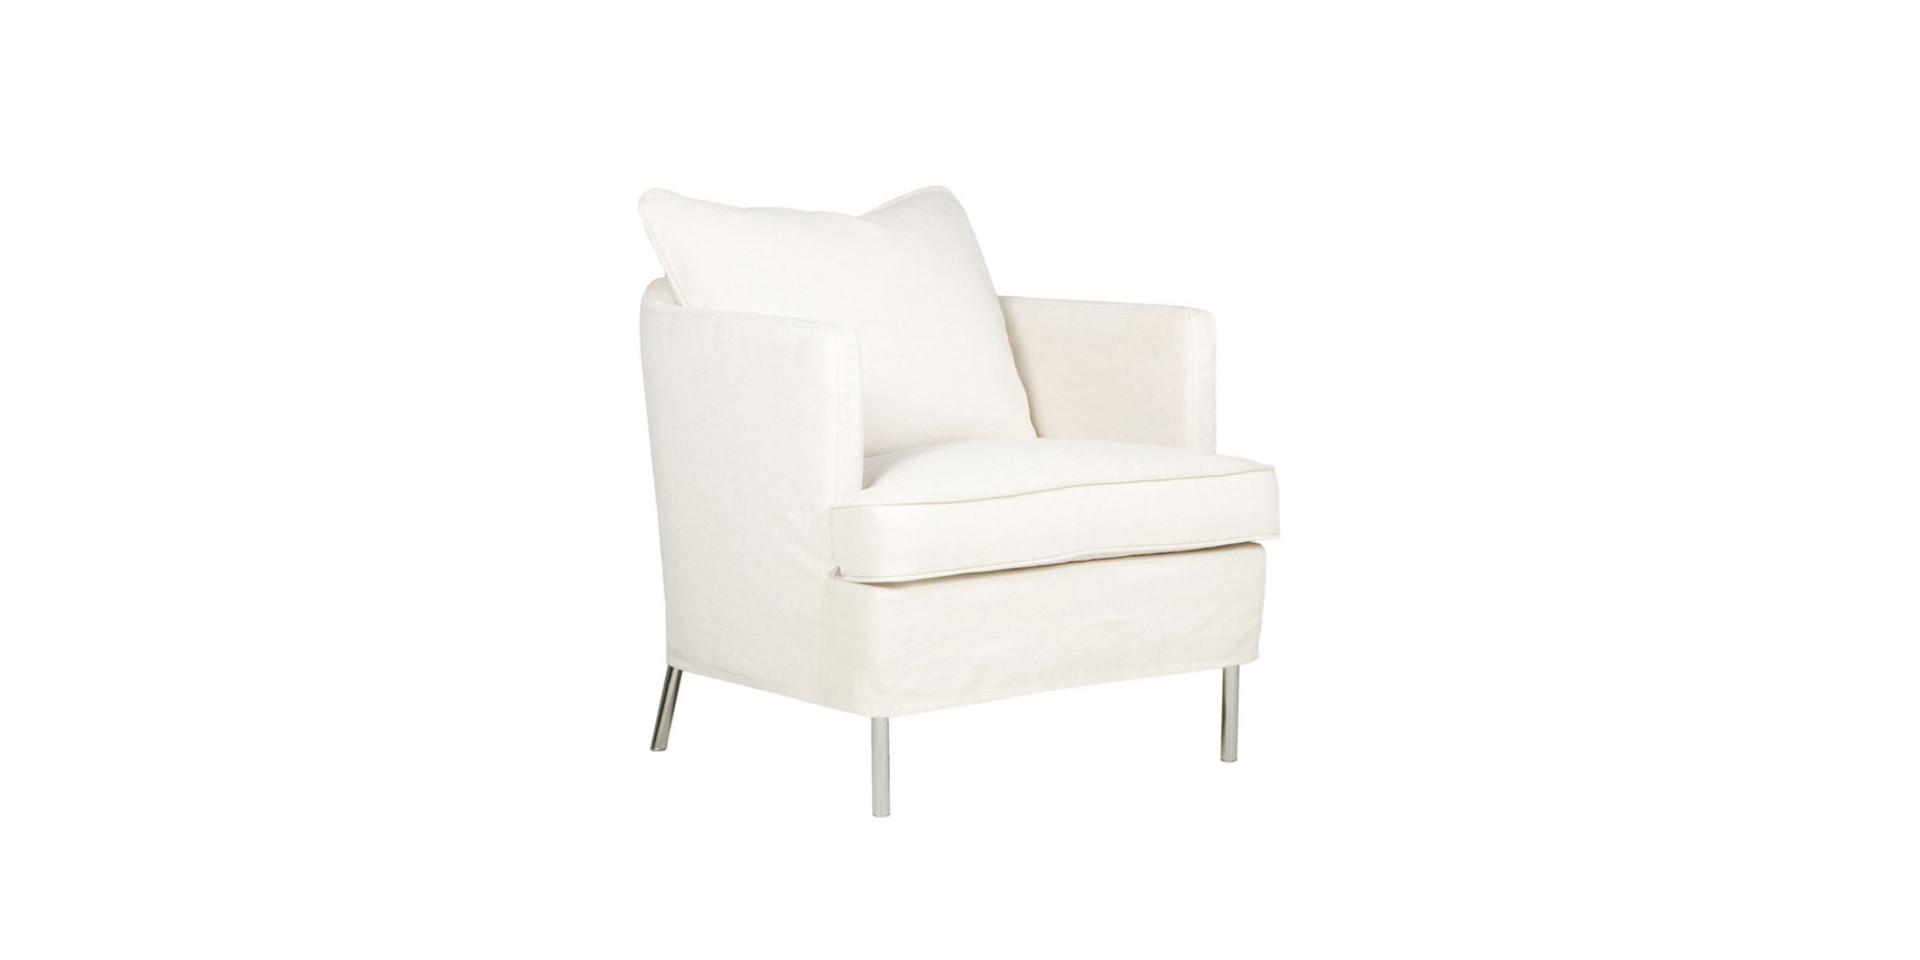 sits-julia-fauteuil-armchair_caleido1419_natur_2